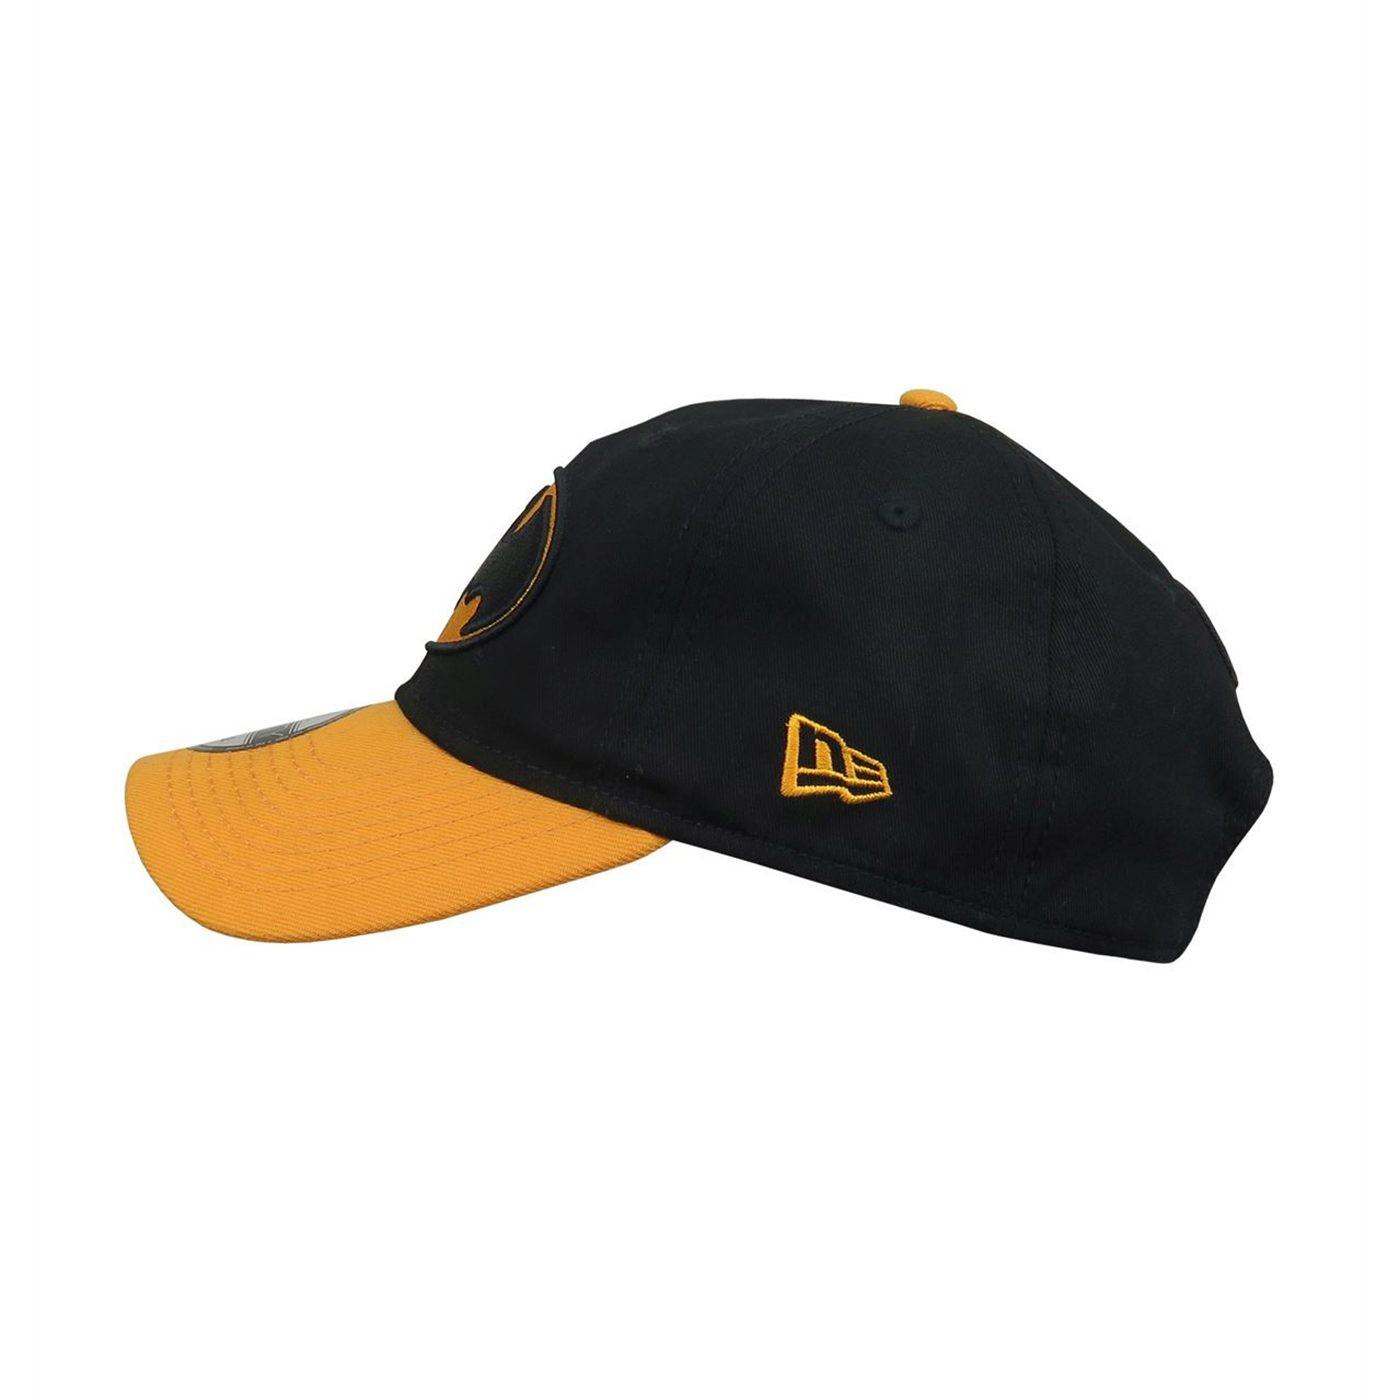 Batman Black And Yellow 9Twenty Adjustable Hat